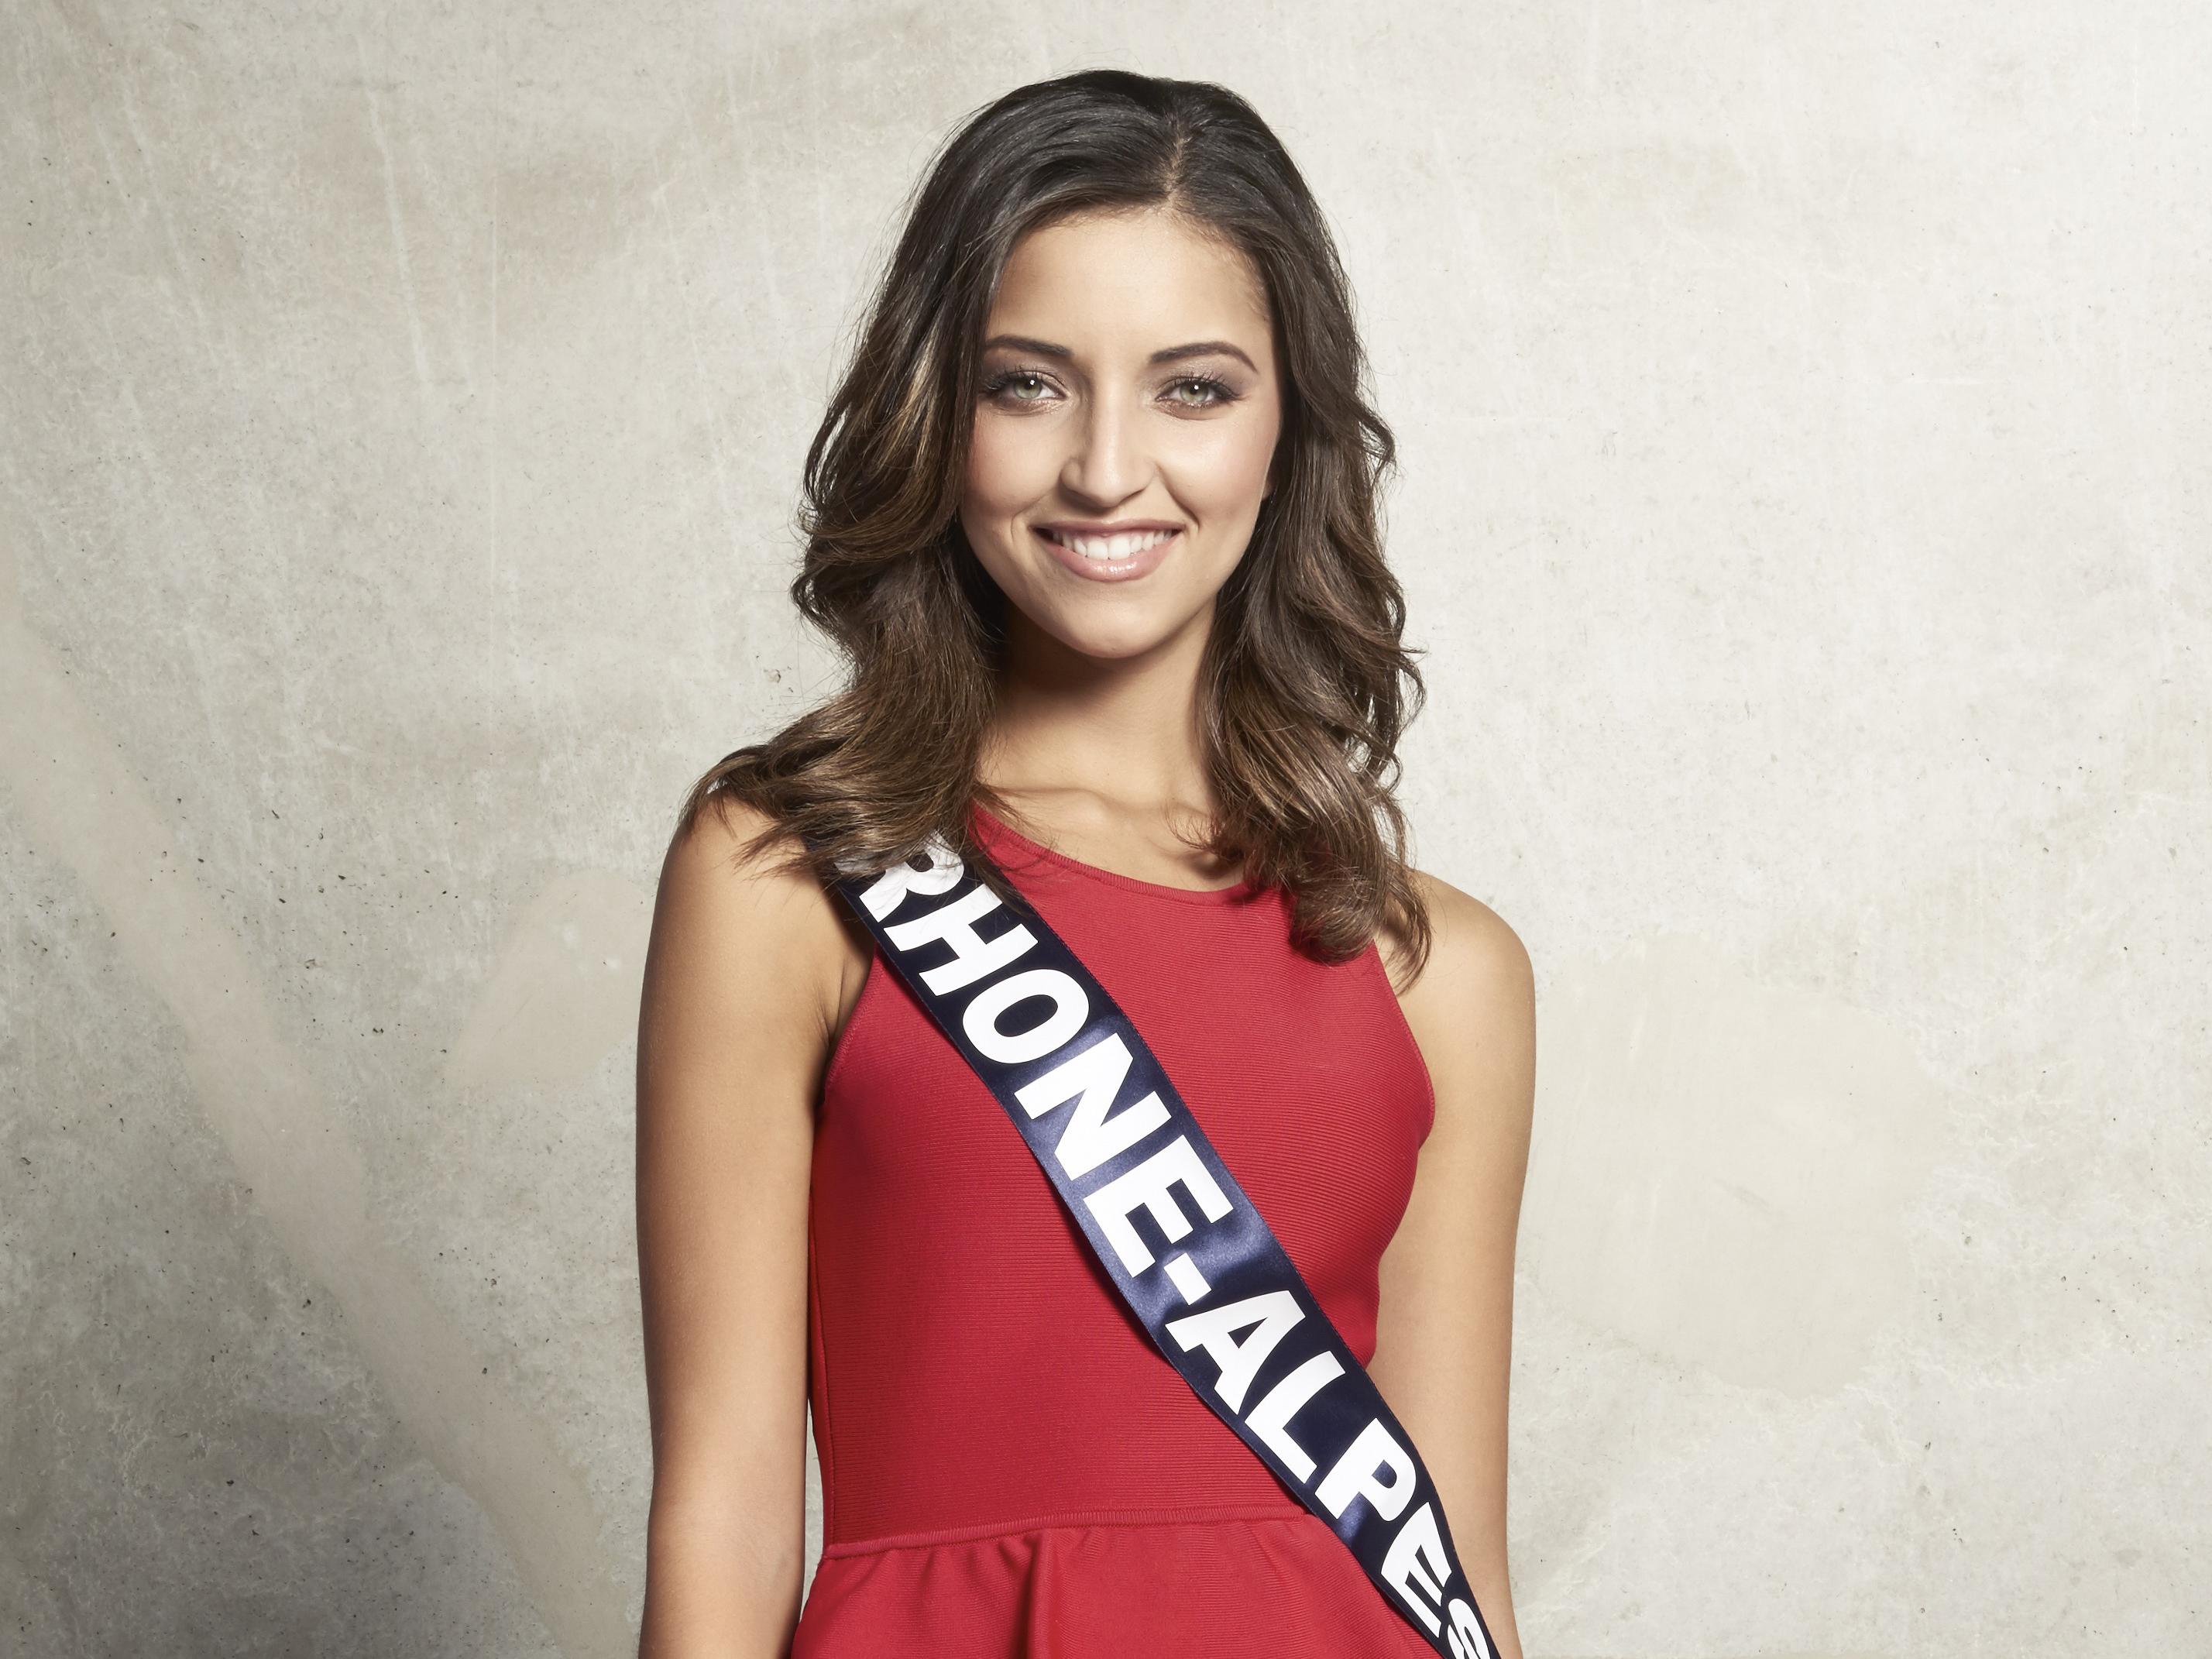 I Miss You Wallpapers Pictures 2015 2016: Miss Rhône-Alpes 2016 : 4 Miss Rhodaniennes